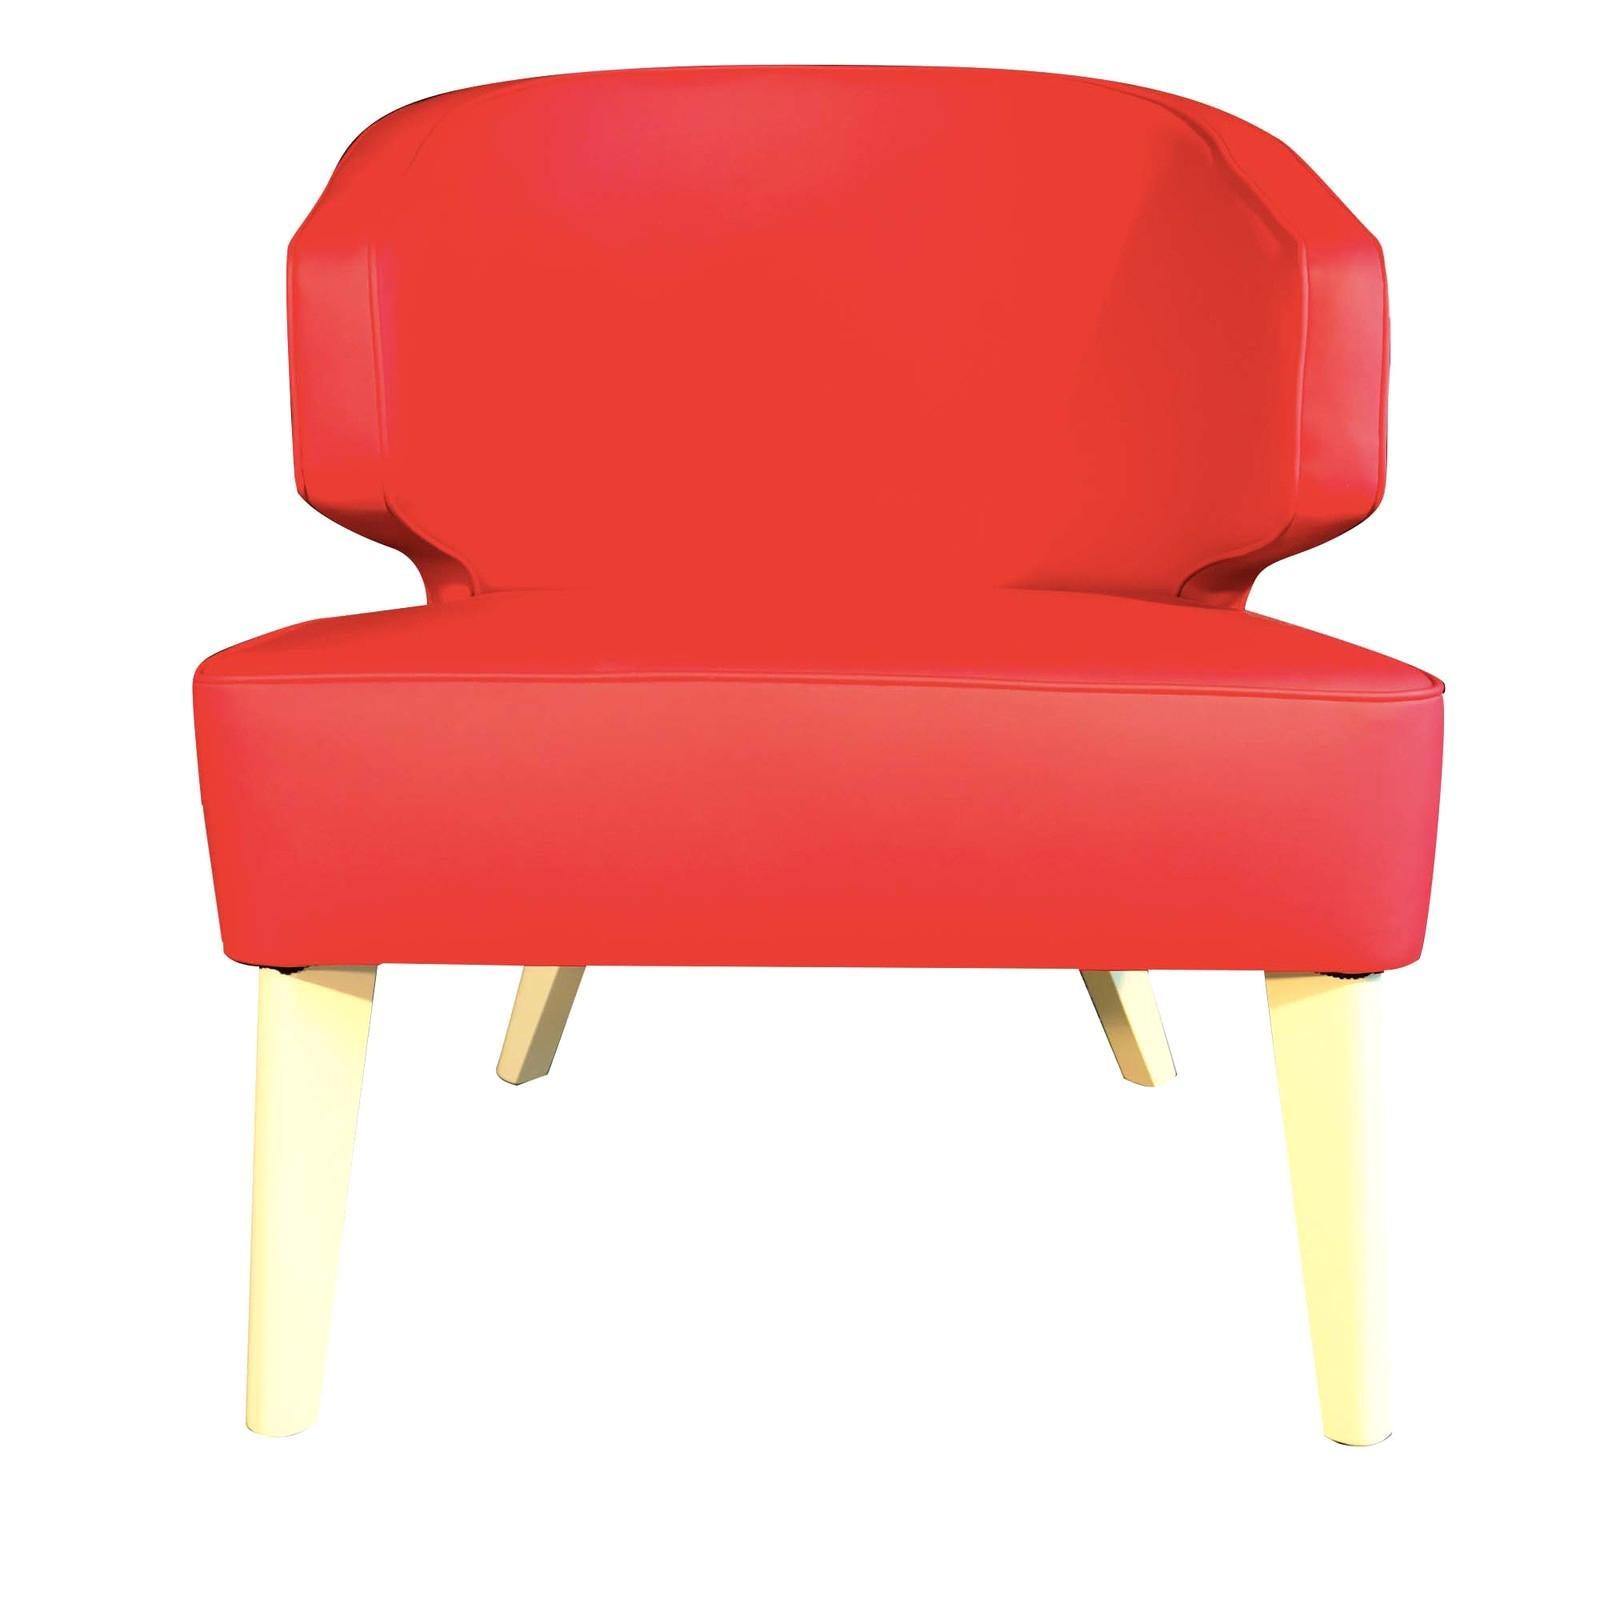 Hugy Red Armchair